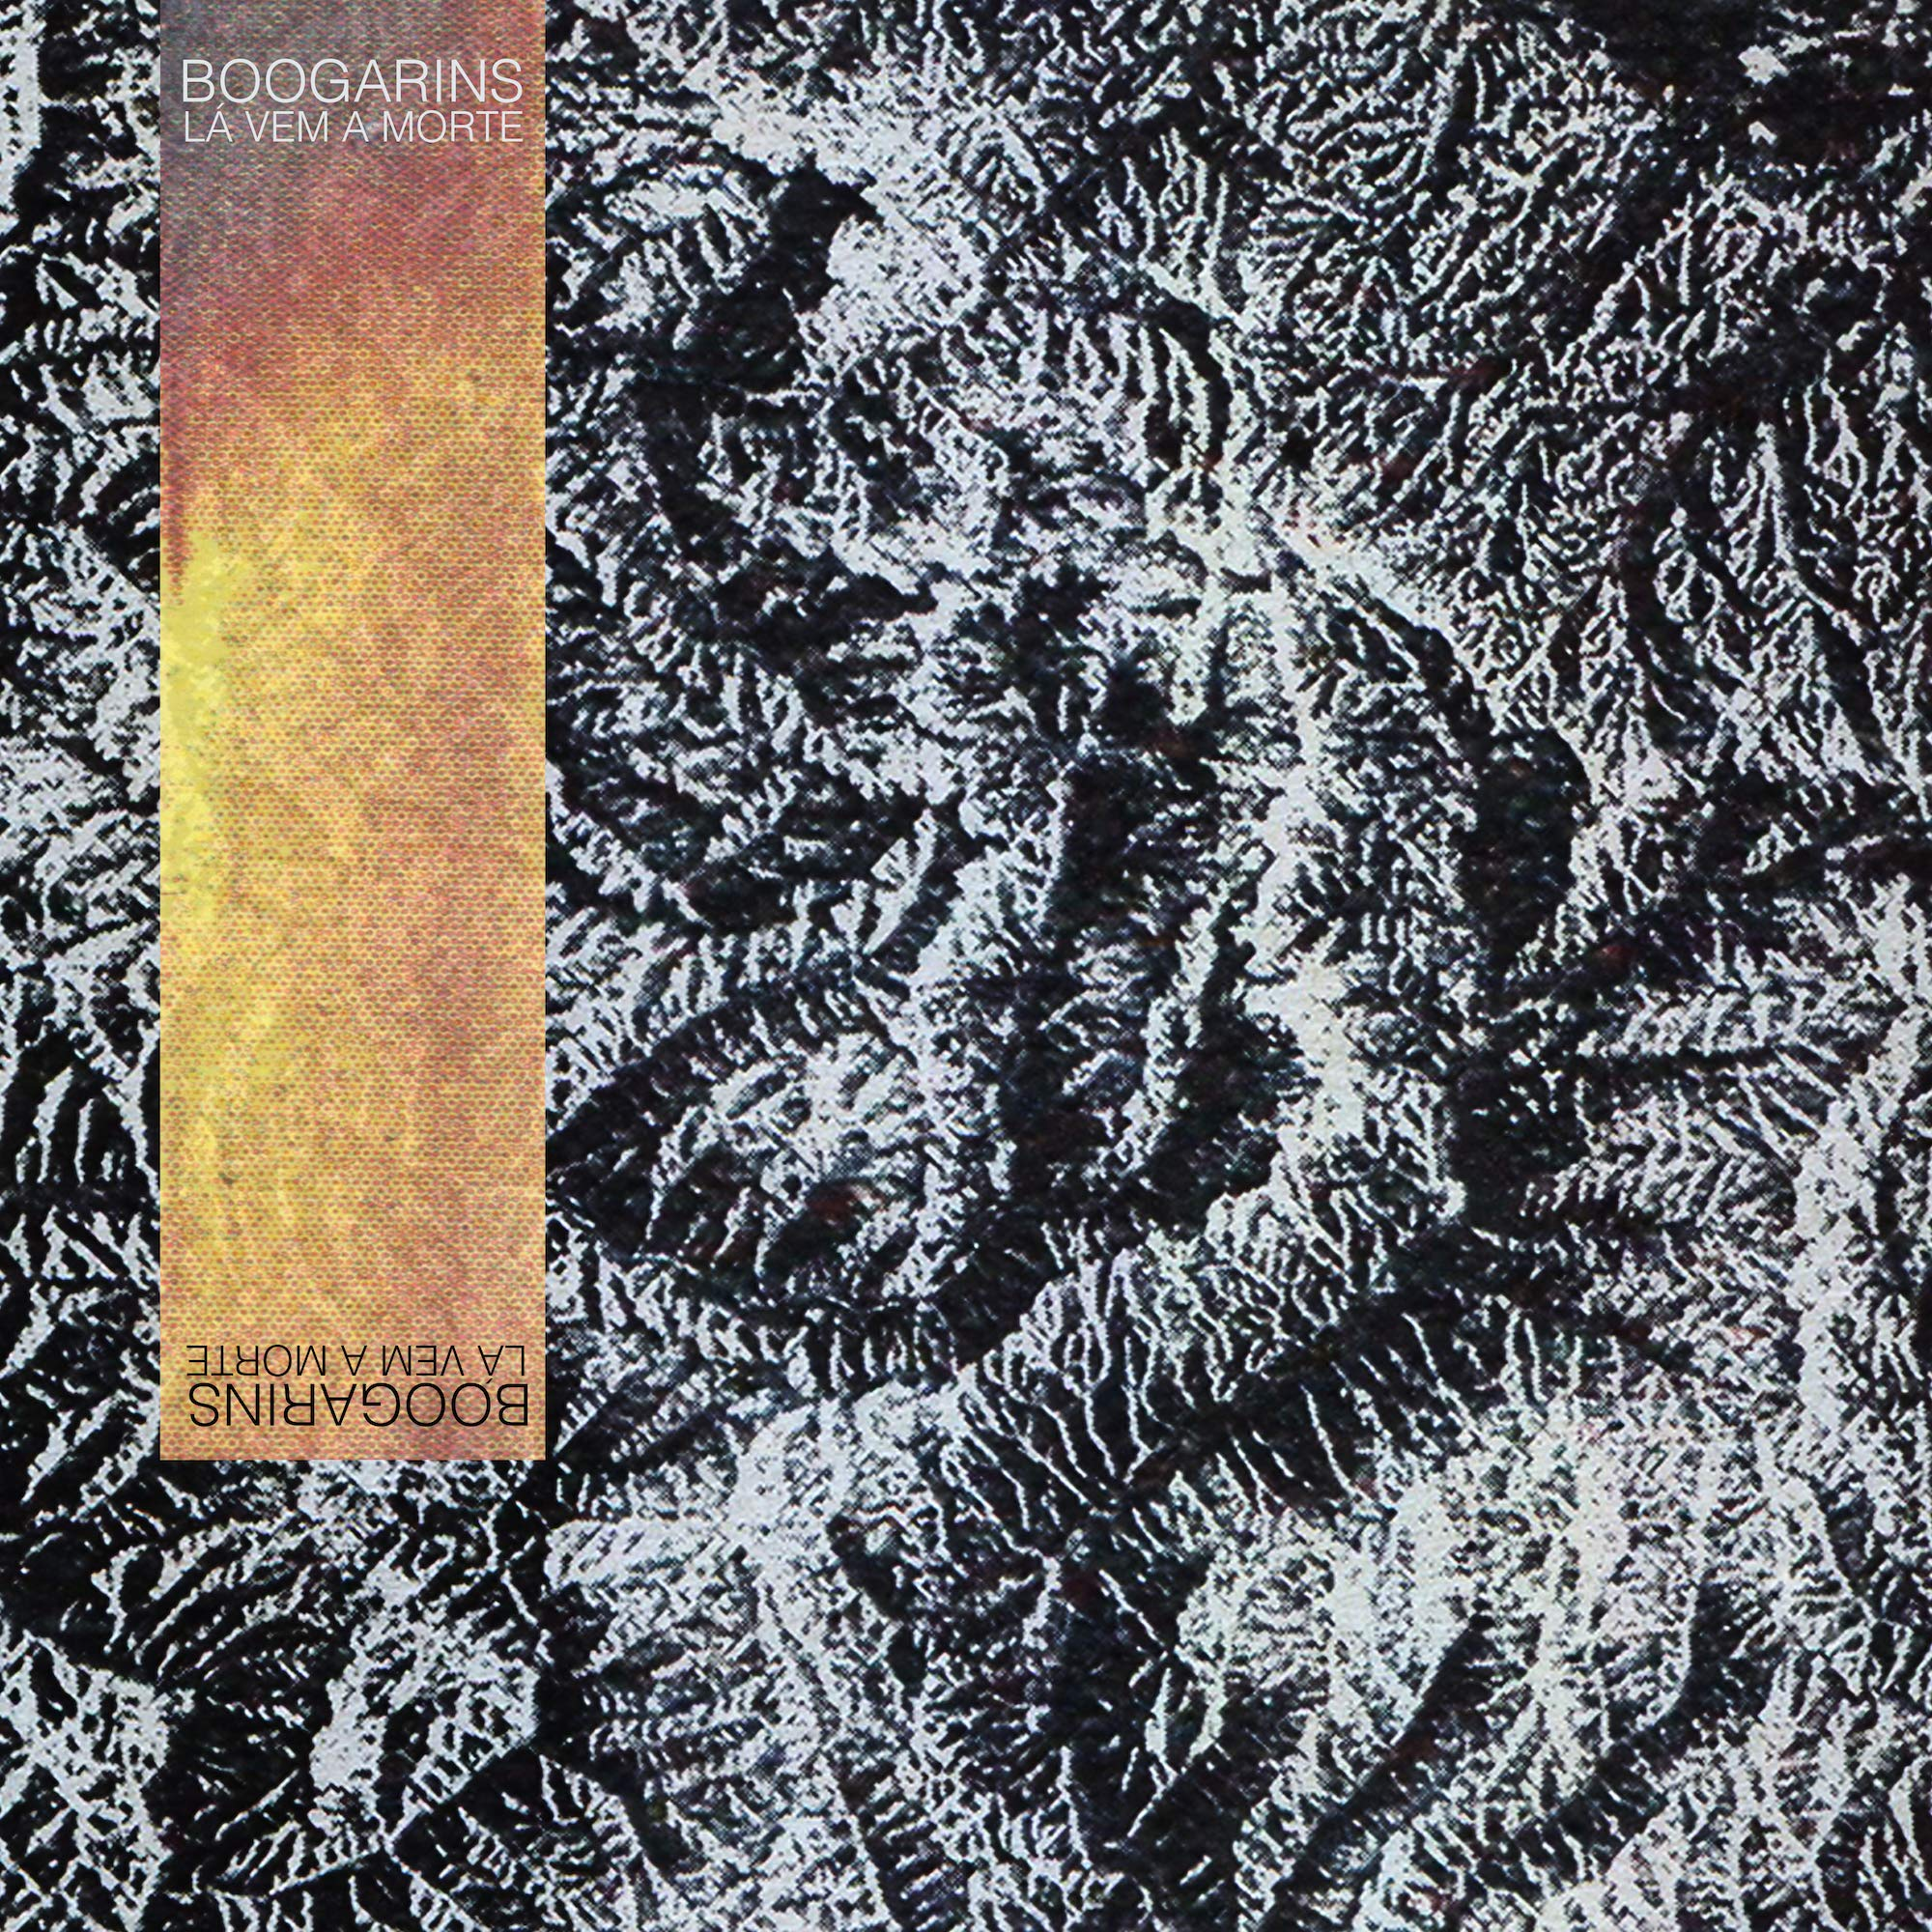 Vinilo : Boogarins - La Vem A Morte (180 Gram Vinyl, Limited Edition, Colored Vinyl)